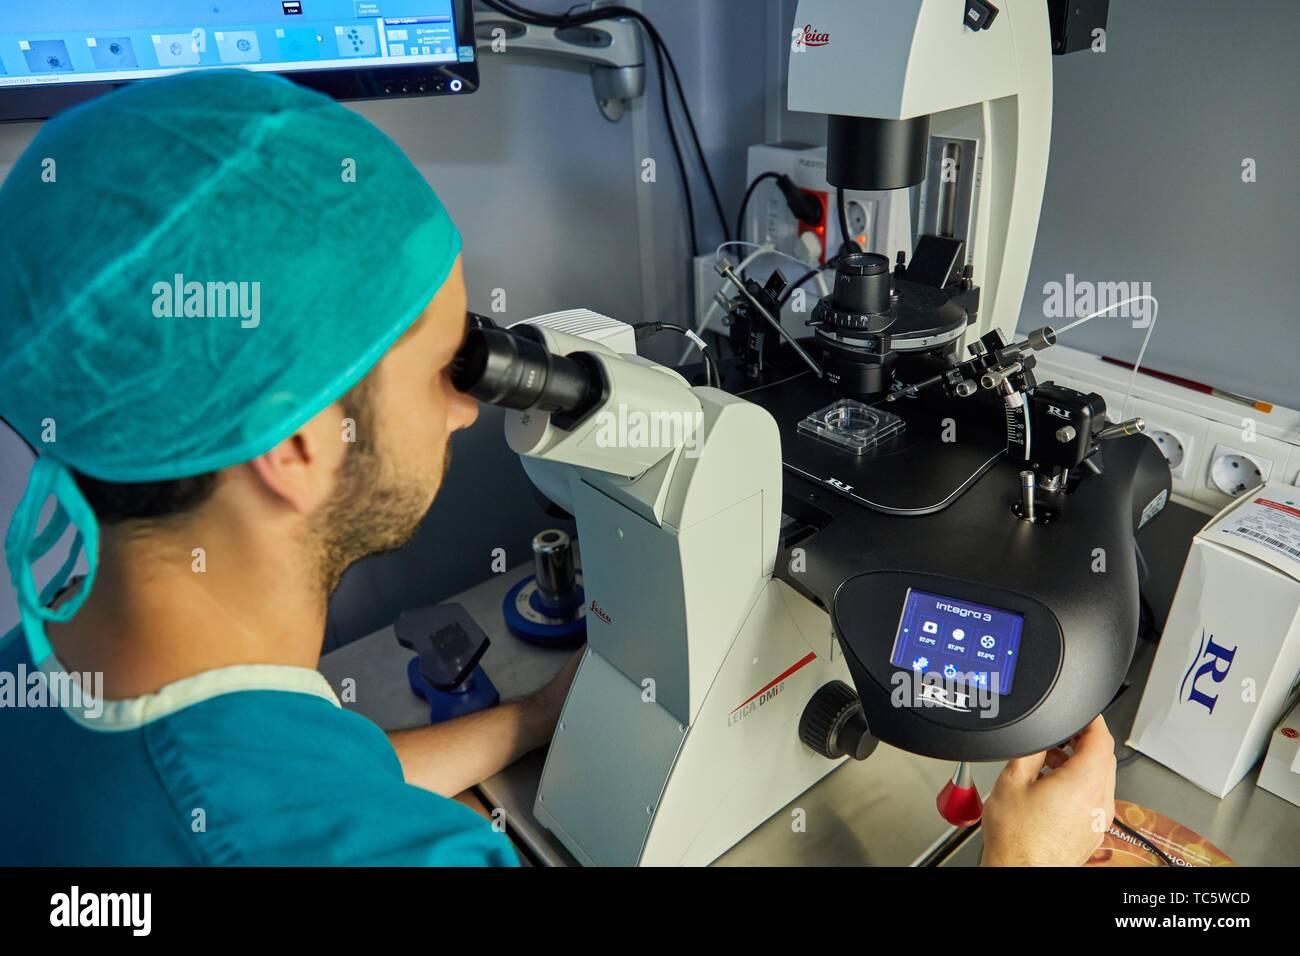 Embryology, ARU, Assisted Reproduction Unit, IVF, In Vitro Fertilization, Intra Cytoplasmic Sperm Injection, Hospital, Donostia, San Sebastian, Stock Photo